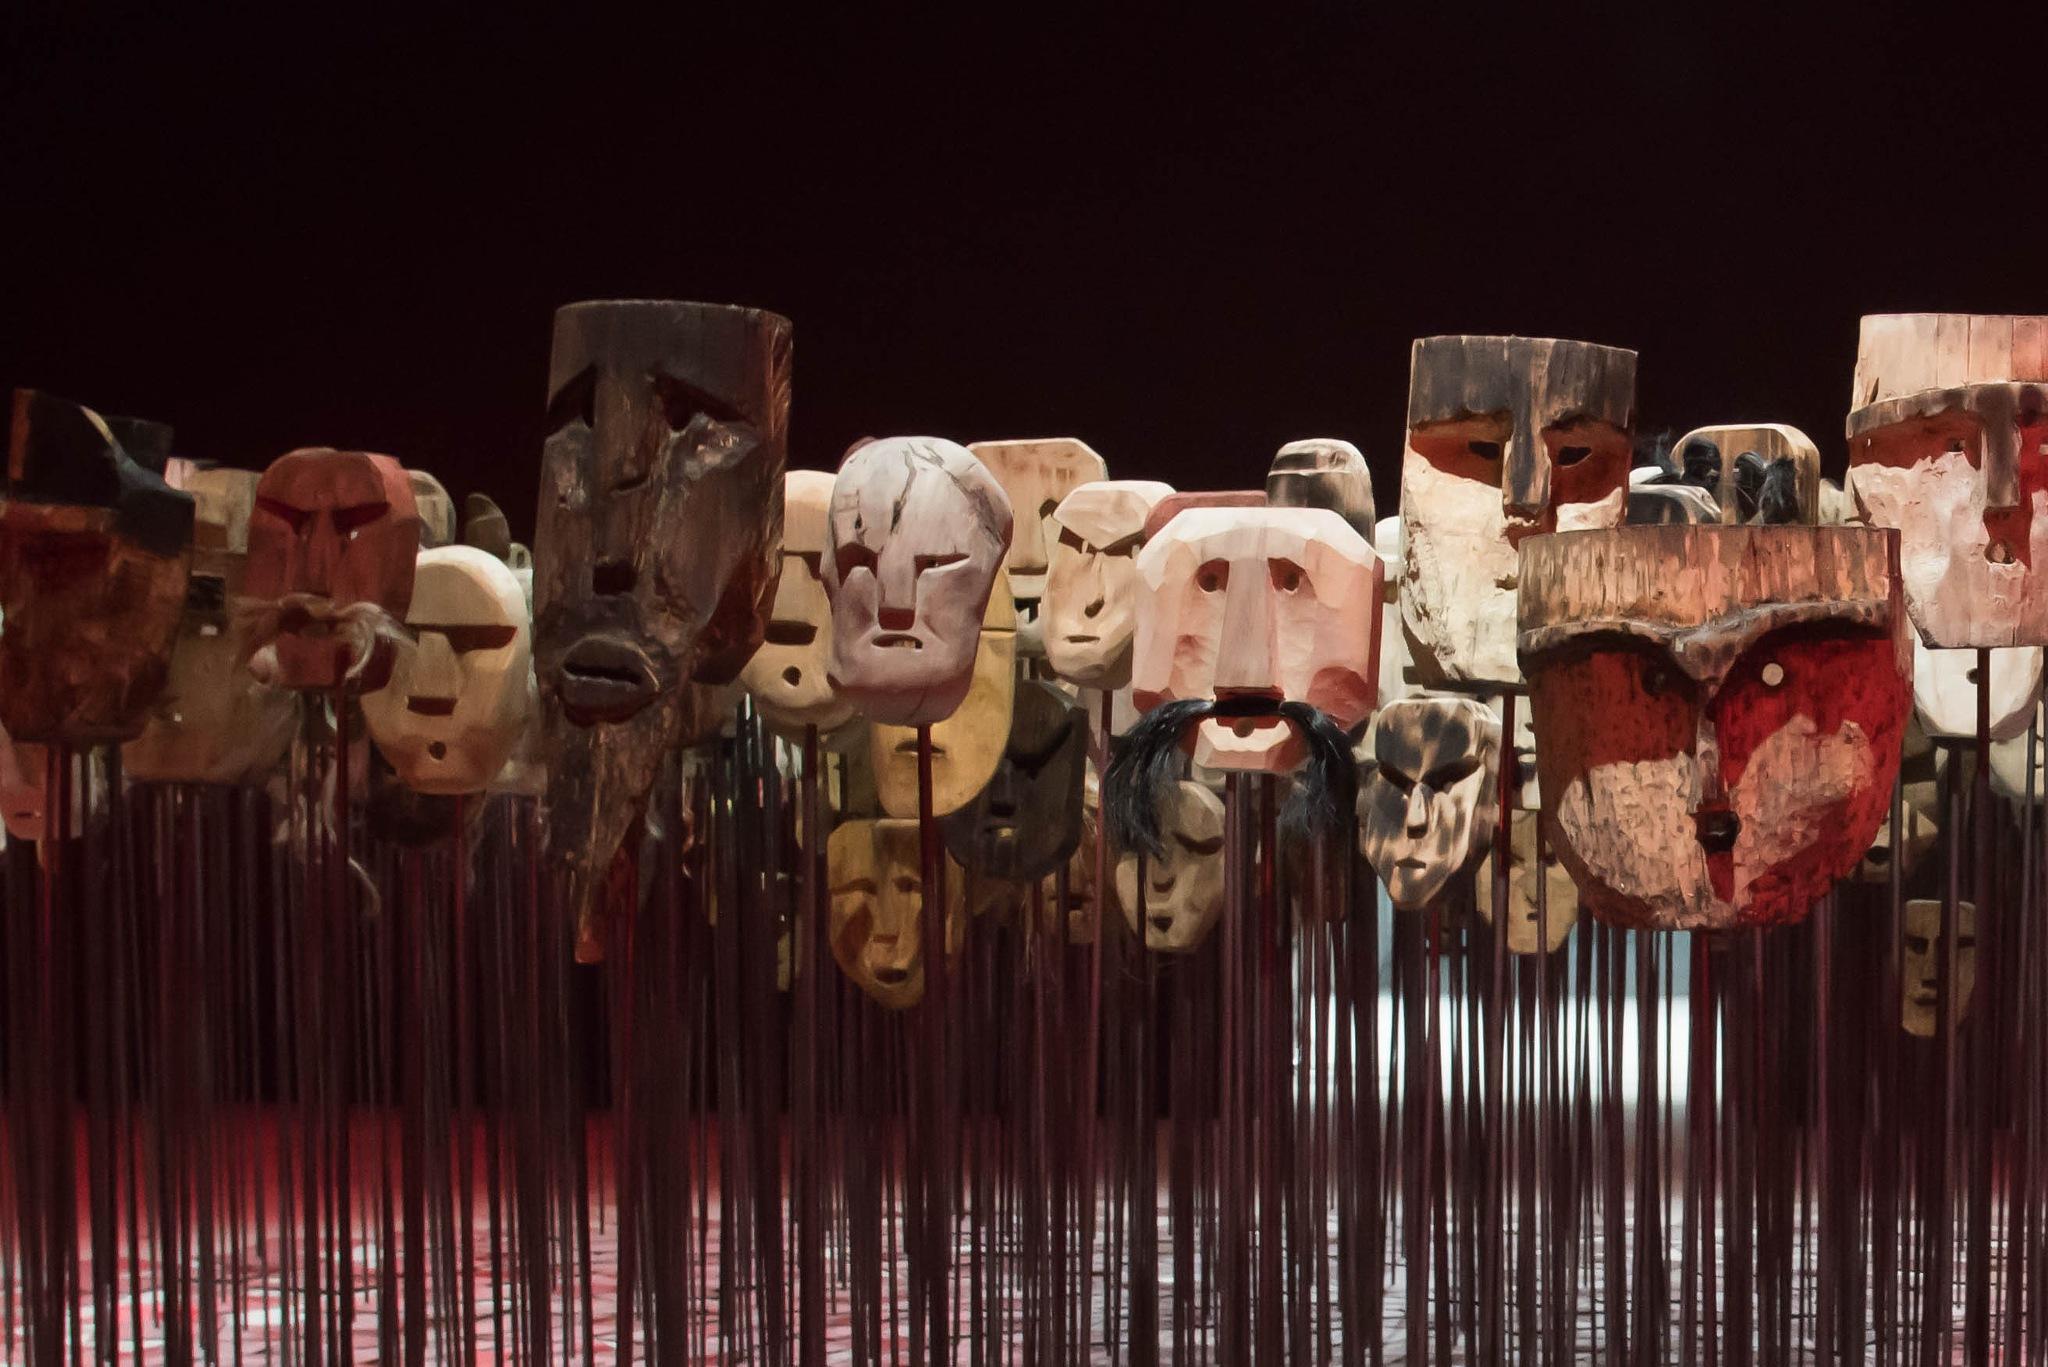 Glave by dusanvladimir